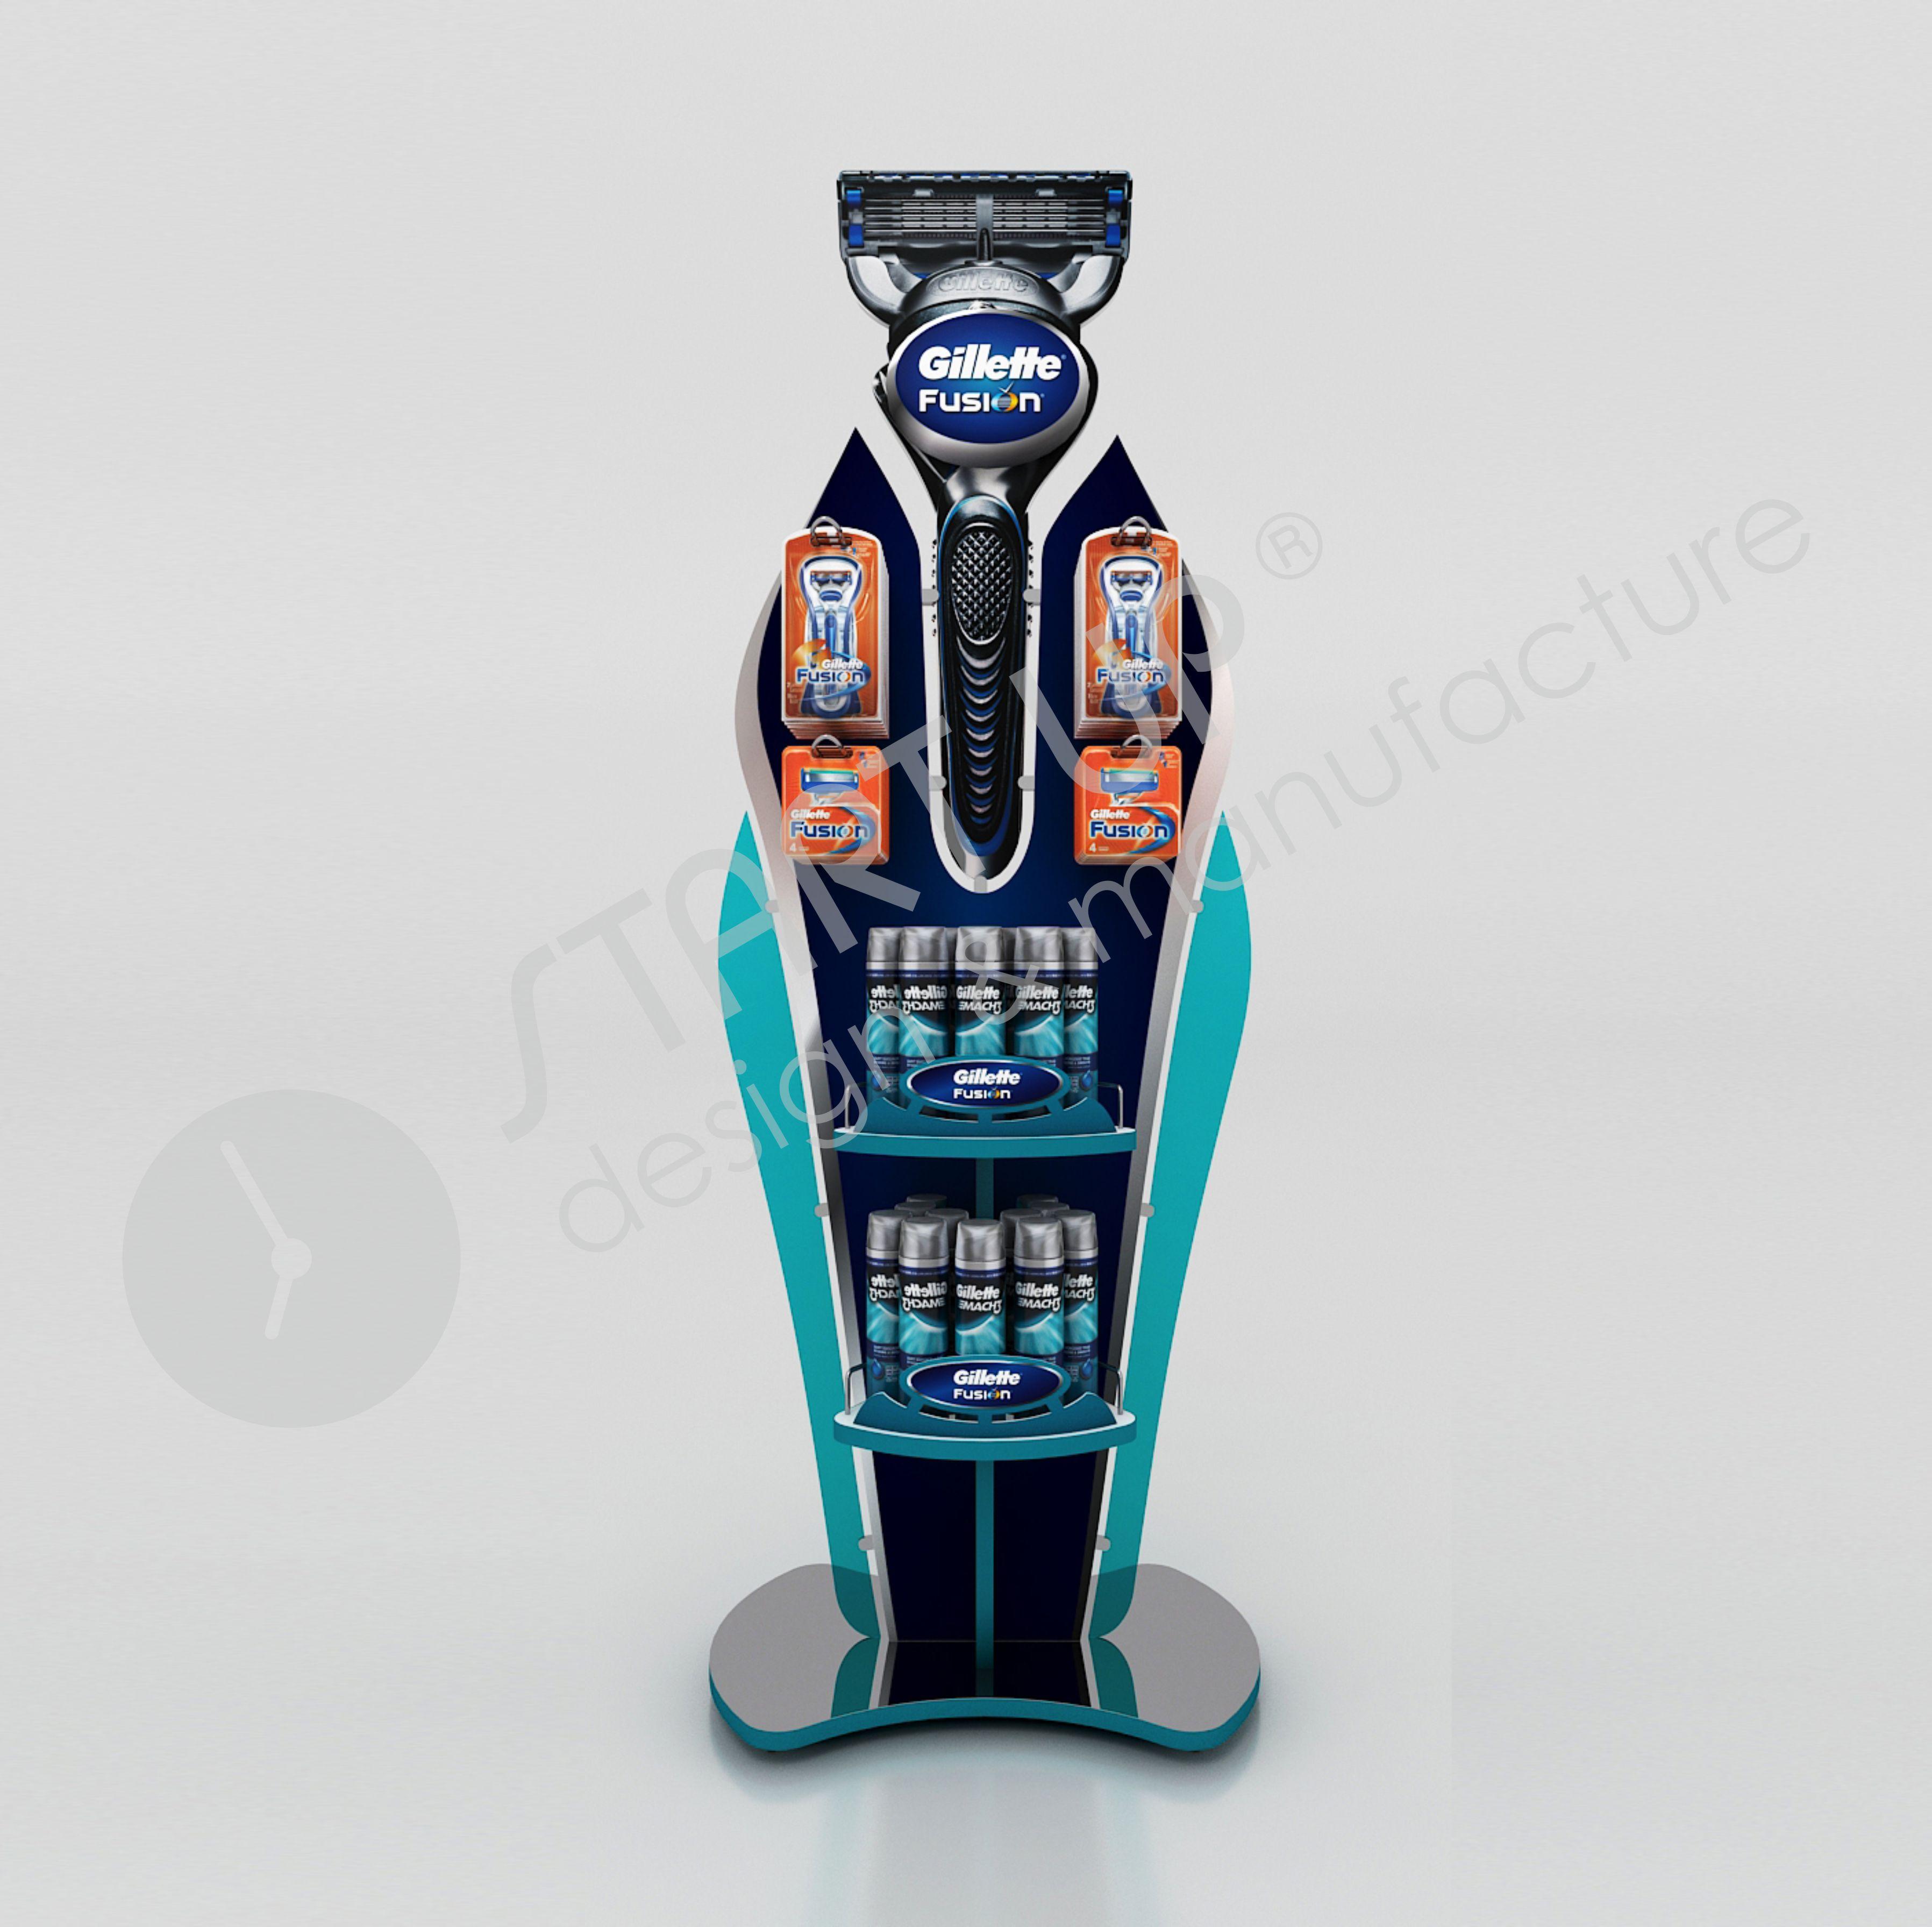 Desktop-boy-midfield stand,kiosk